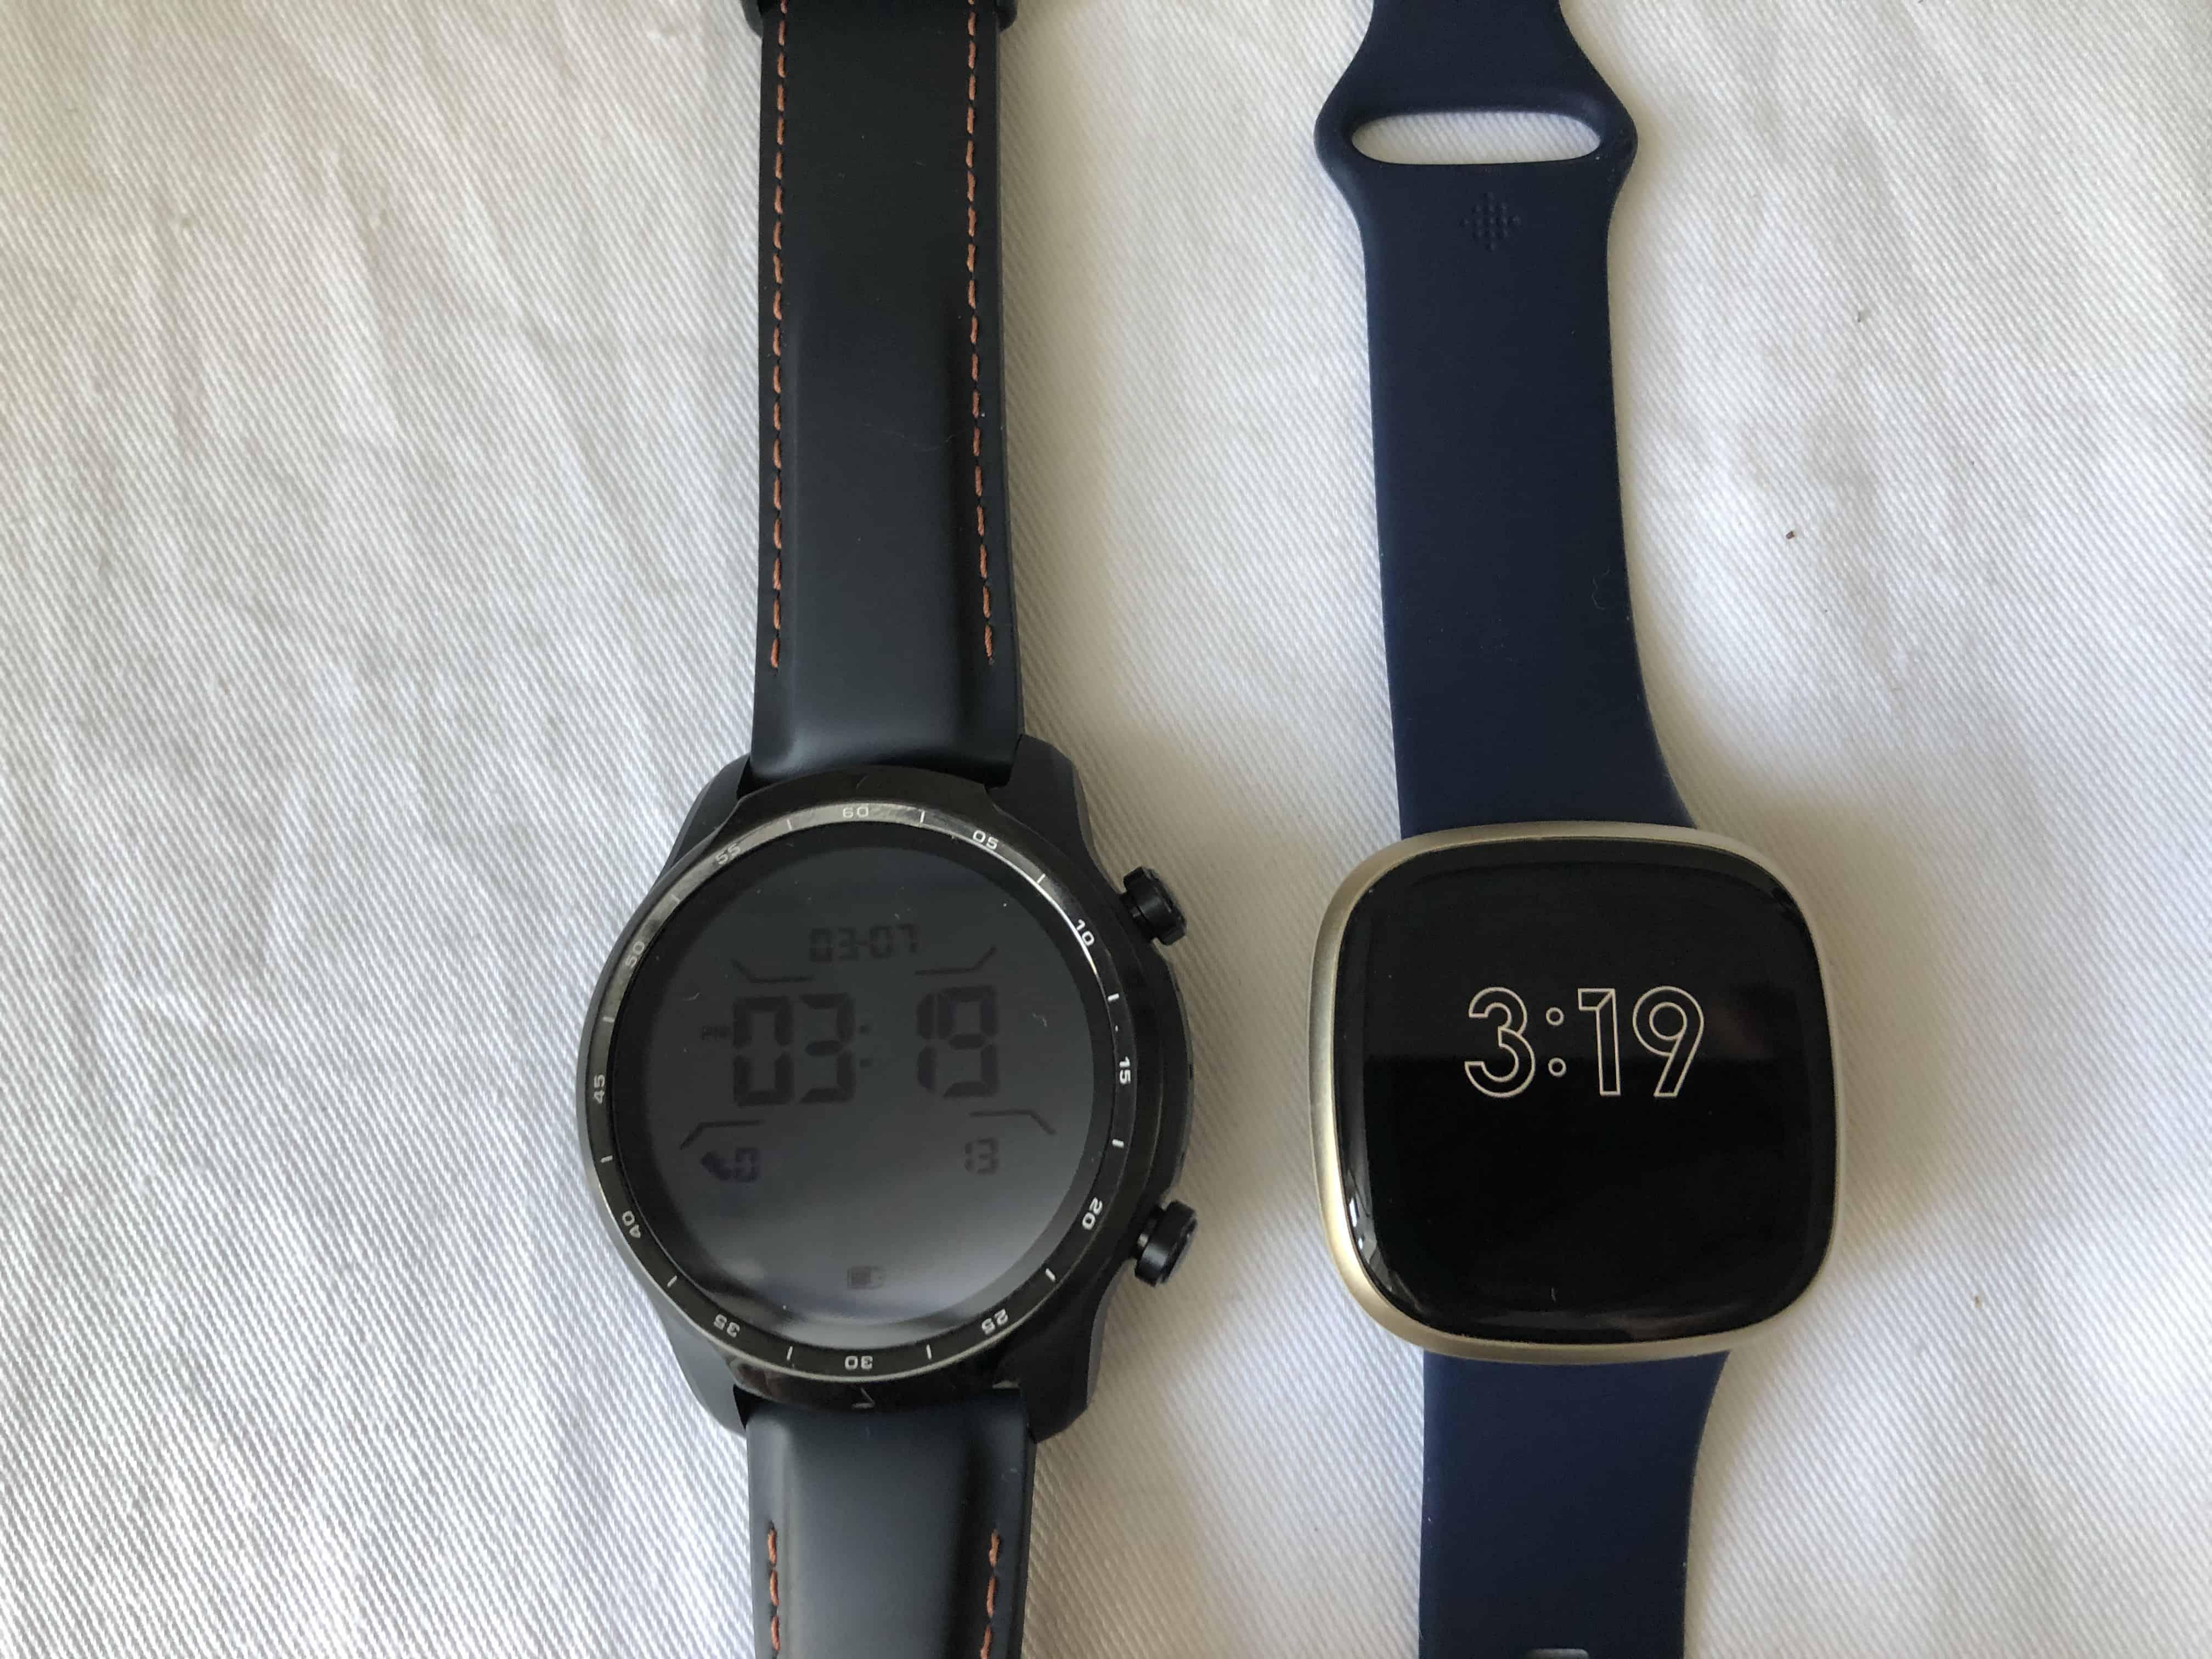 ticwatch pro 3 vs fitbit versa 3